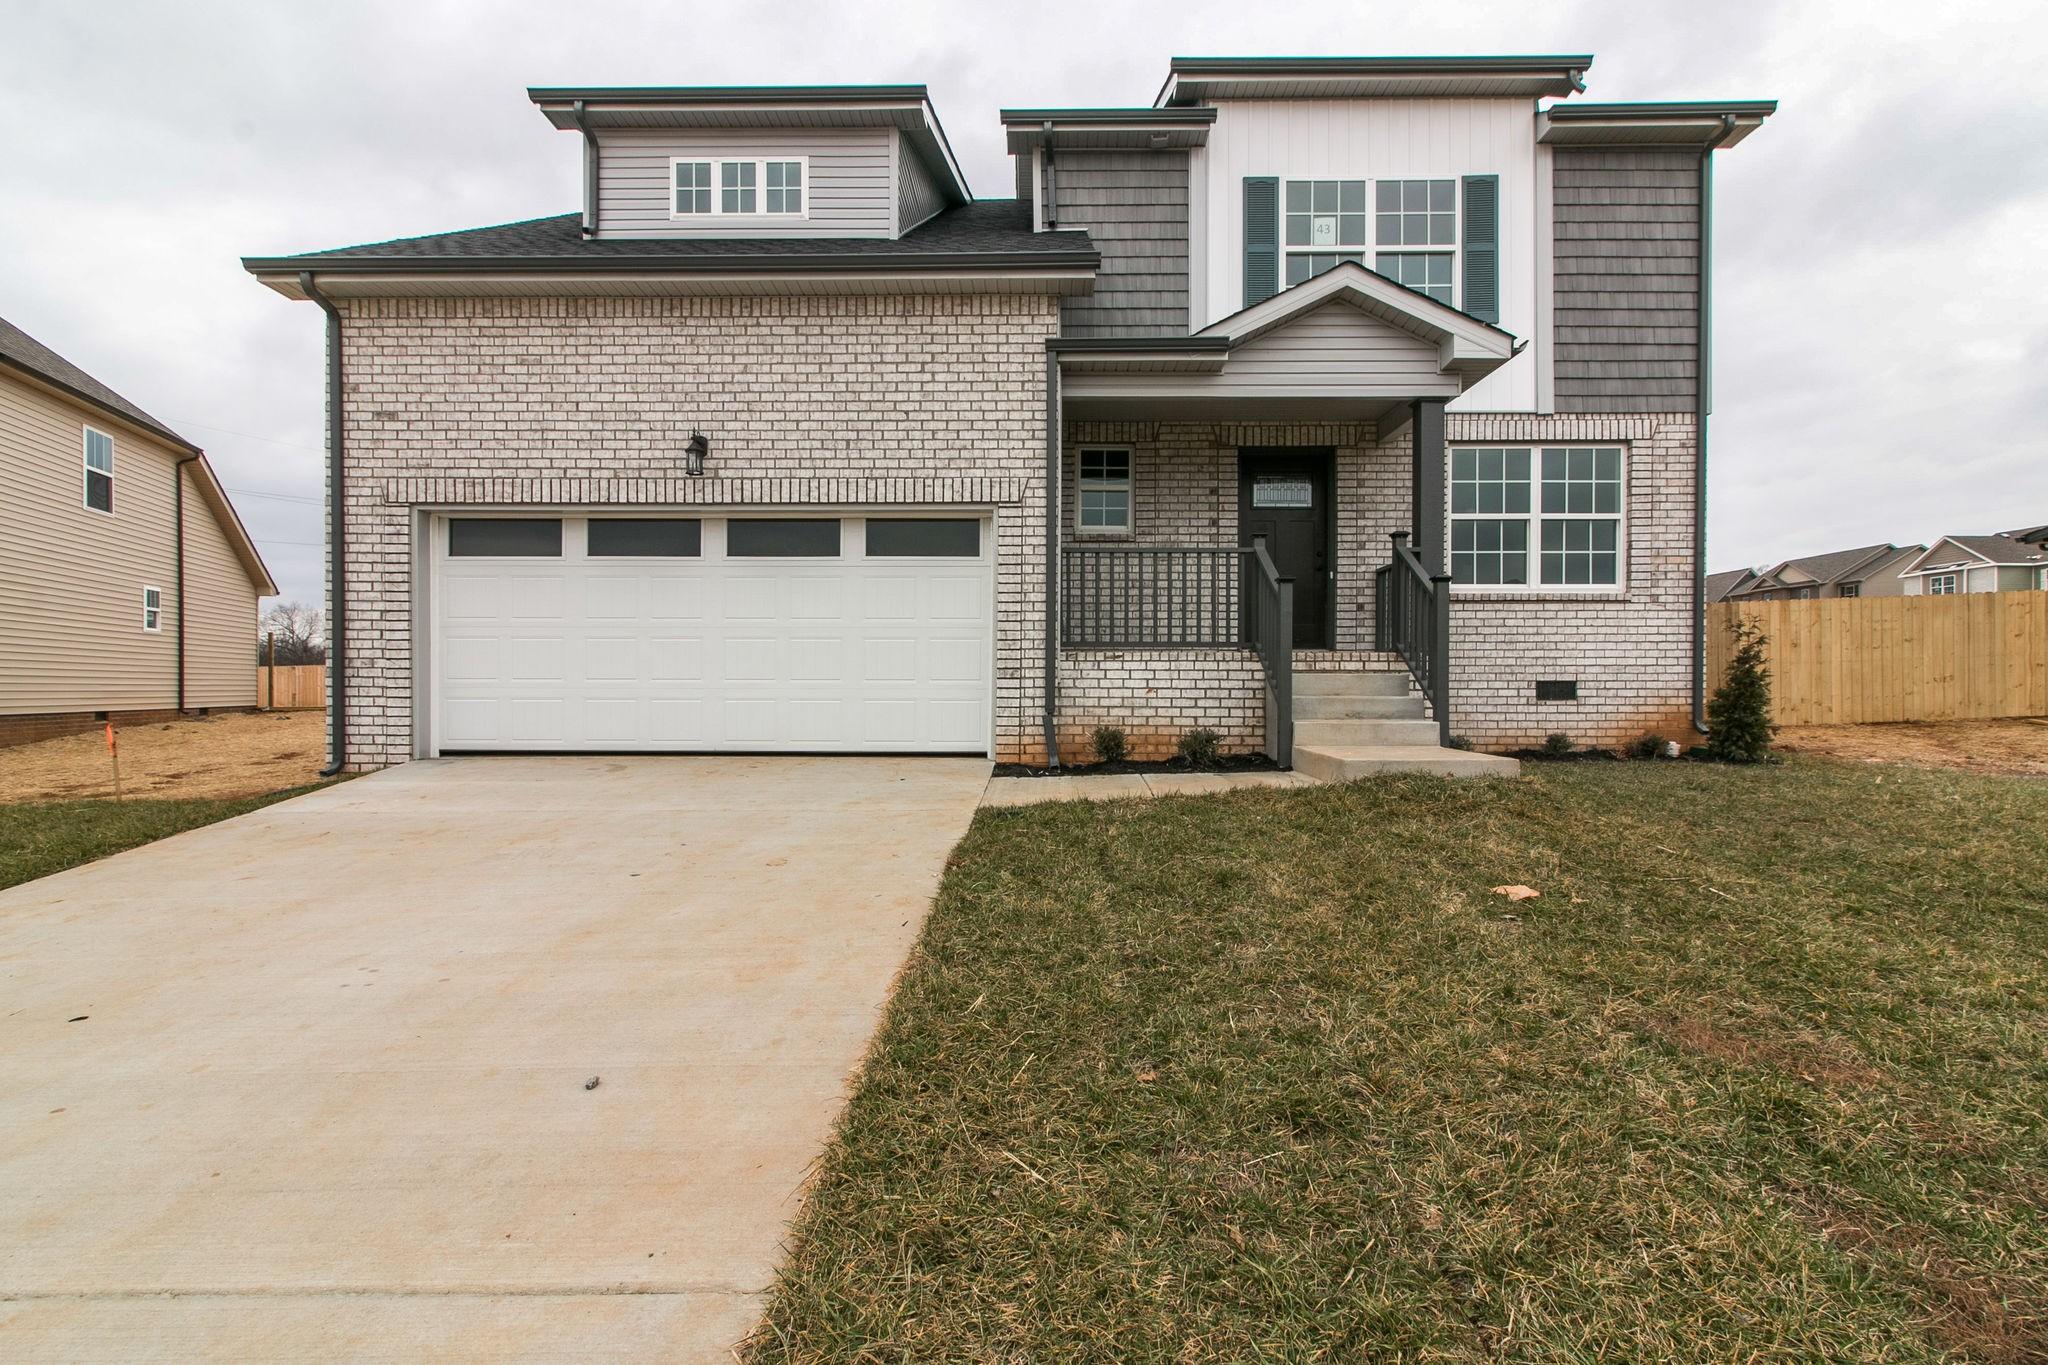 894 Wild Elm Ct (lot 43), Clarksville, TN 37042 - Clarksville, TN real estate listing